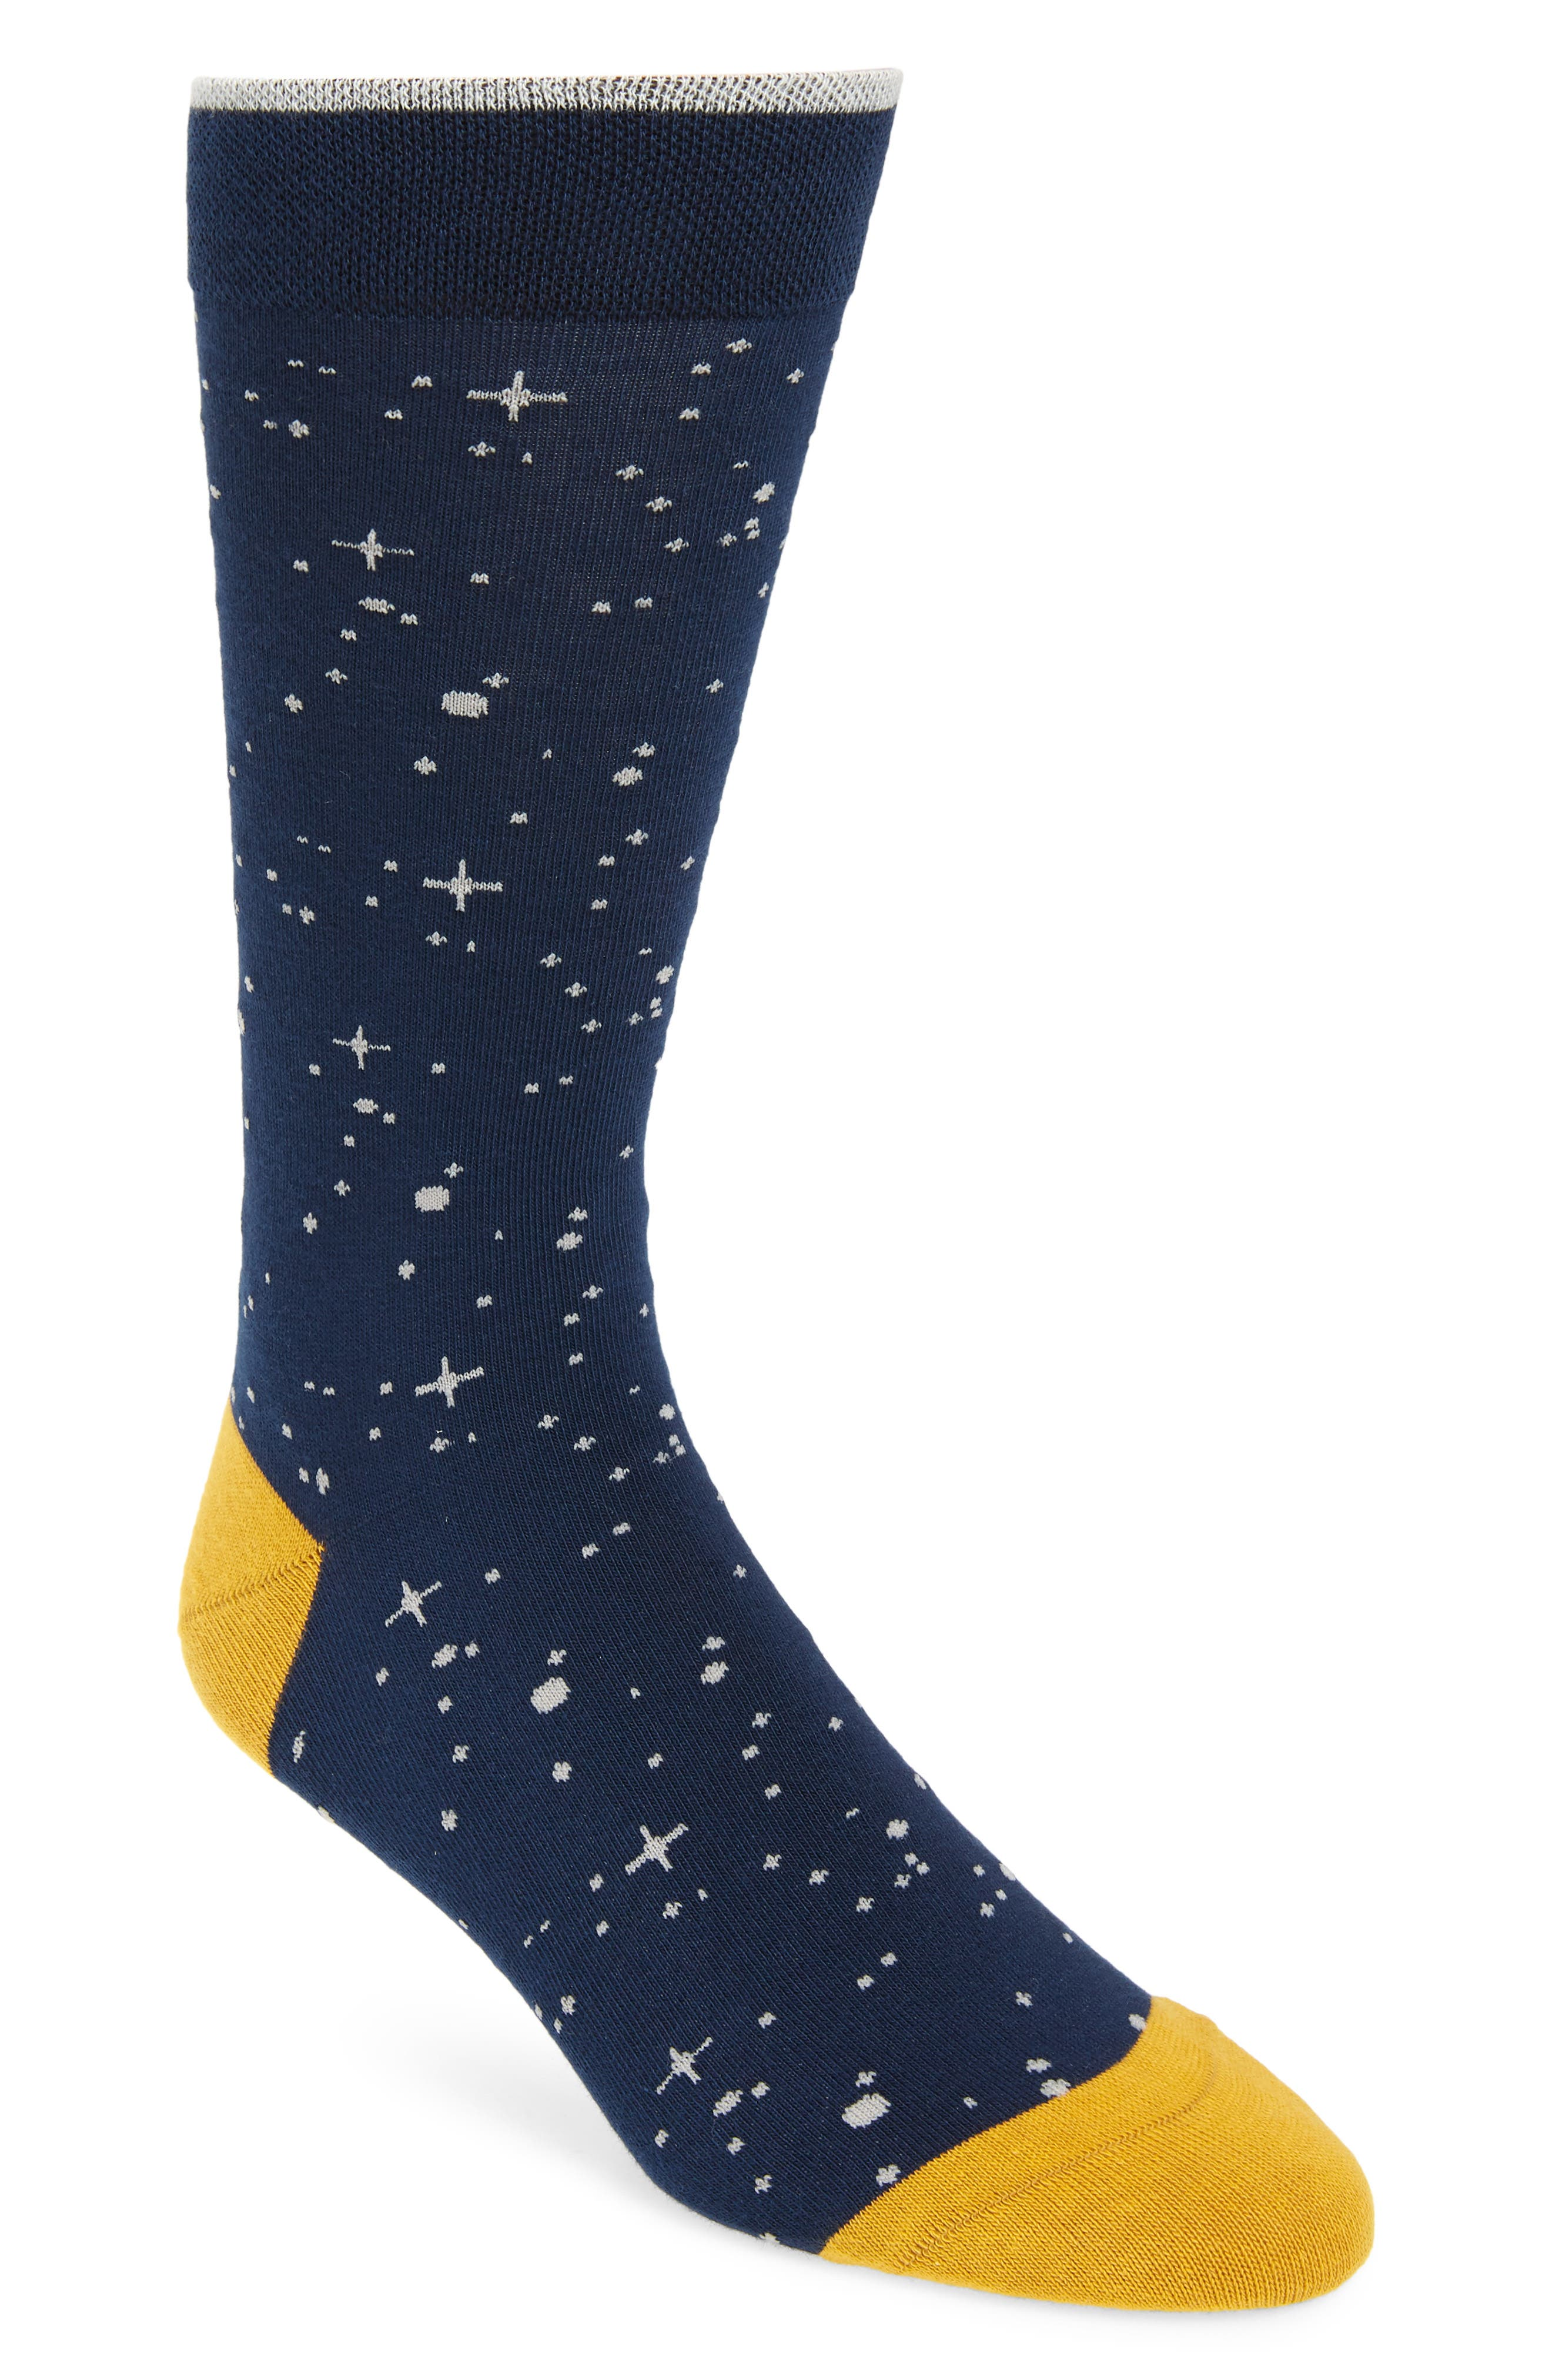 TED BAKER LONDON, Starry Night Socks, Main thumbnail 1, color, NAVY